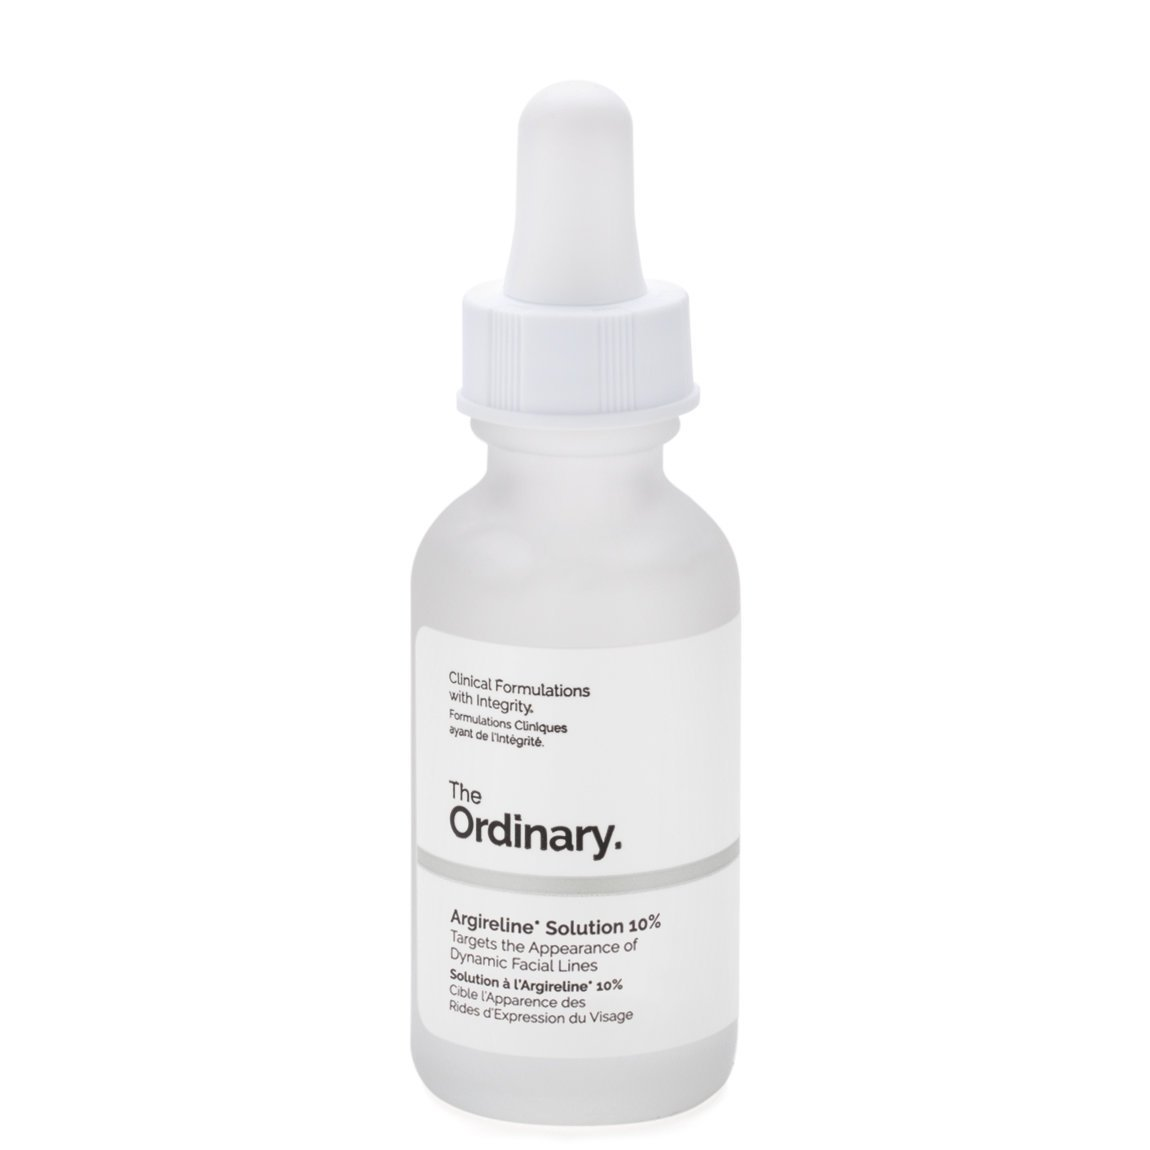 The Ordinary Argireline Solution 10% (30ml) A Lightweight Serum with 10% Argireline Peptide Complex for Anti Aging